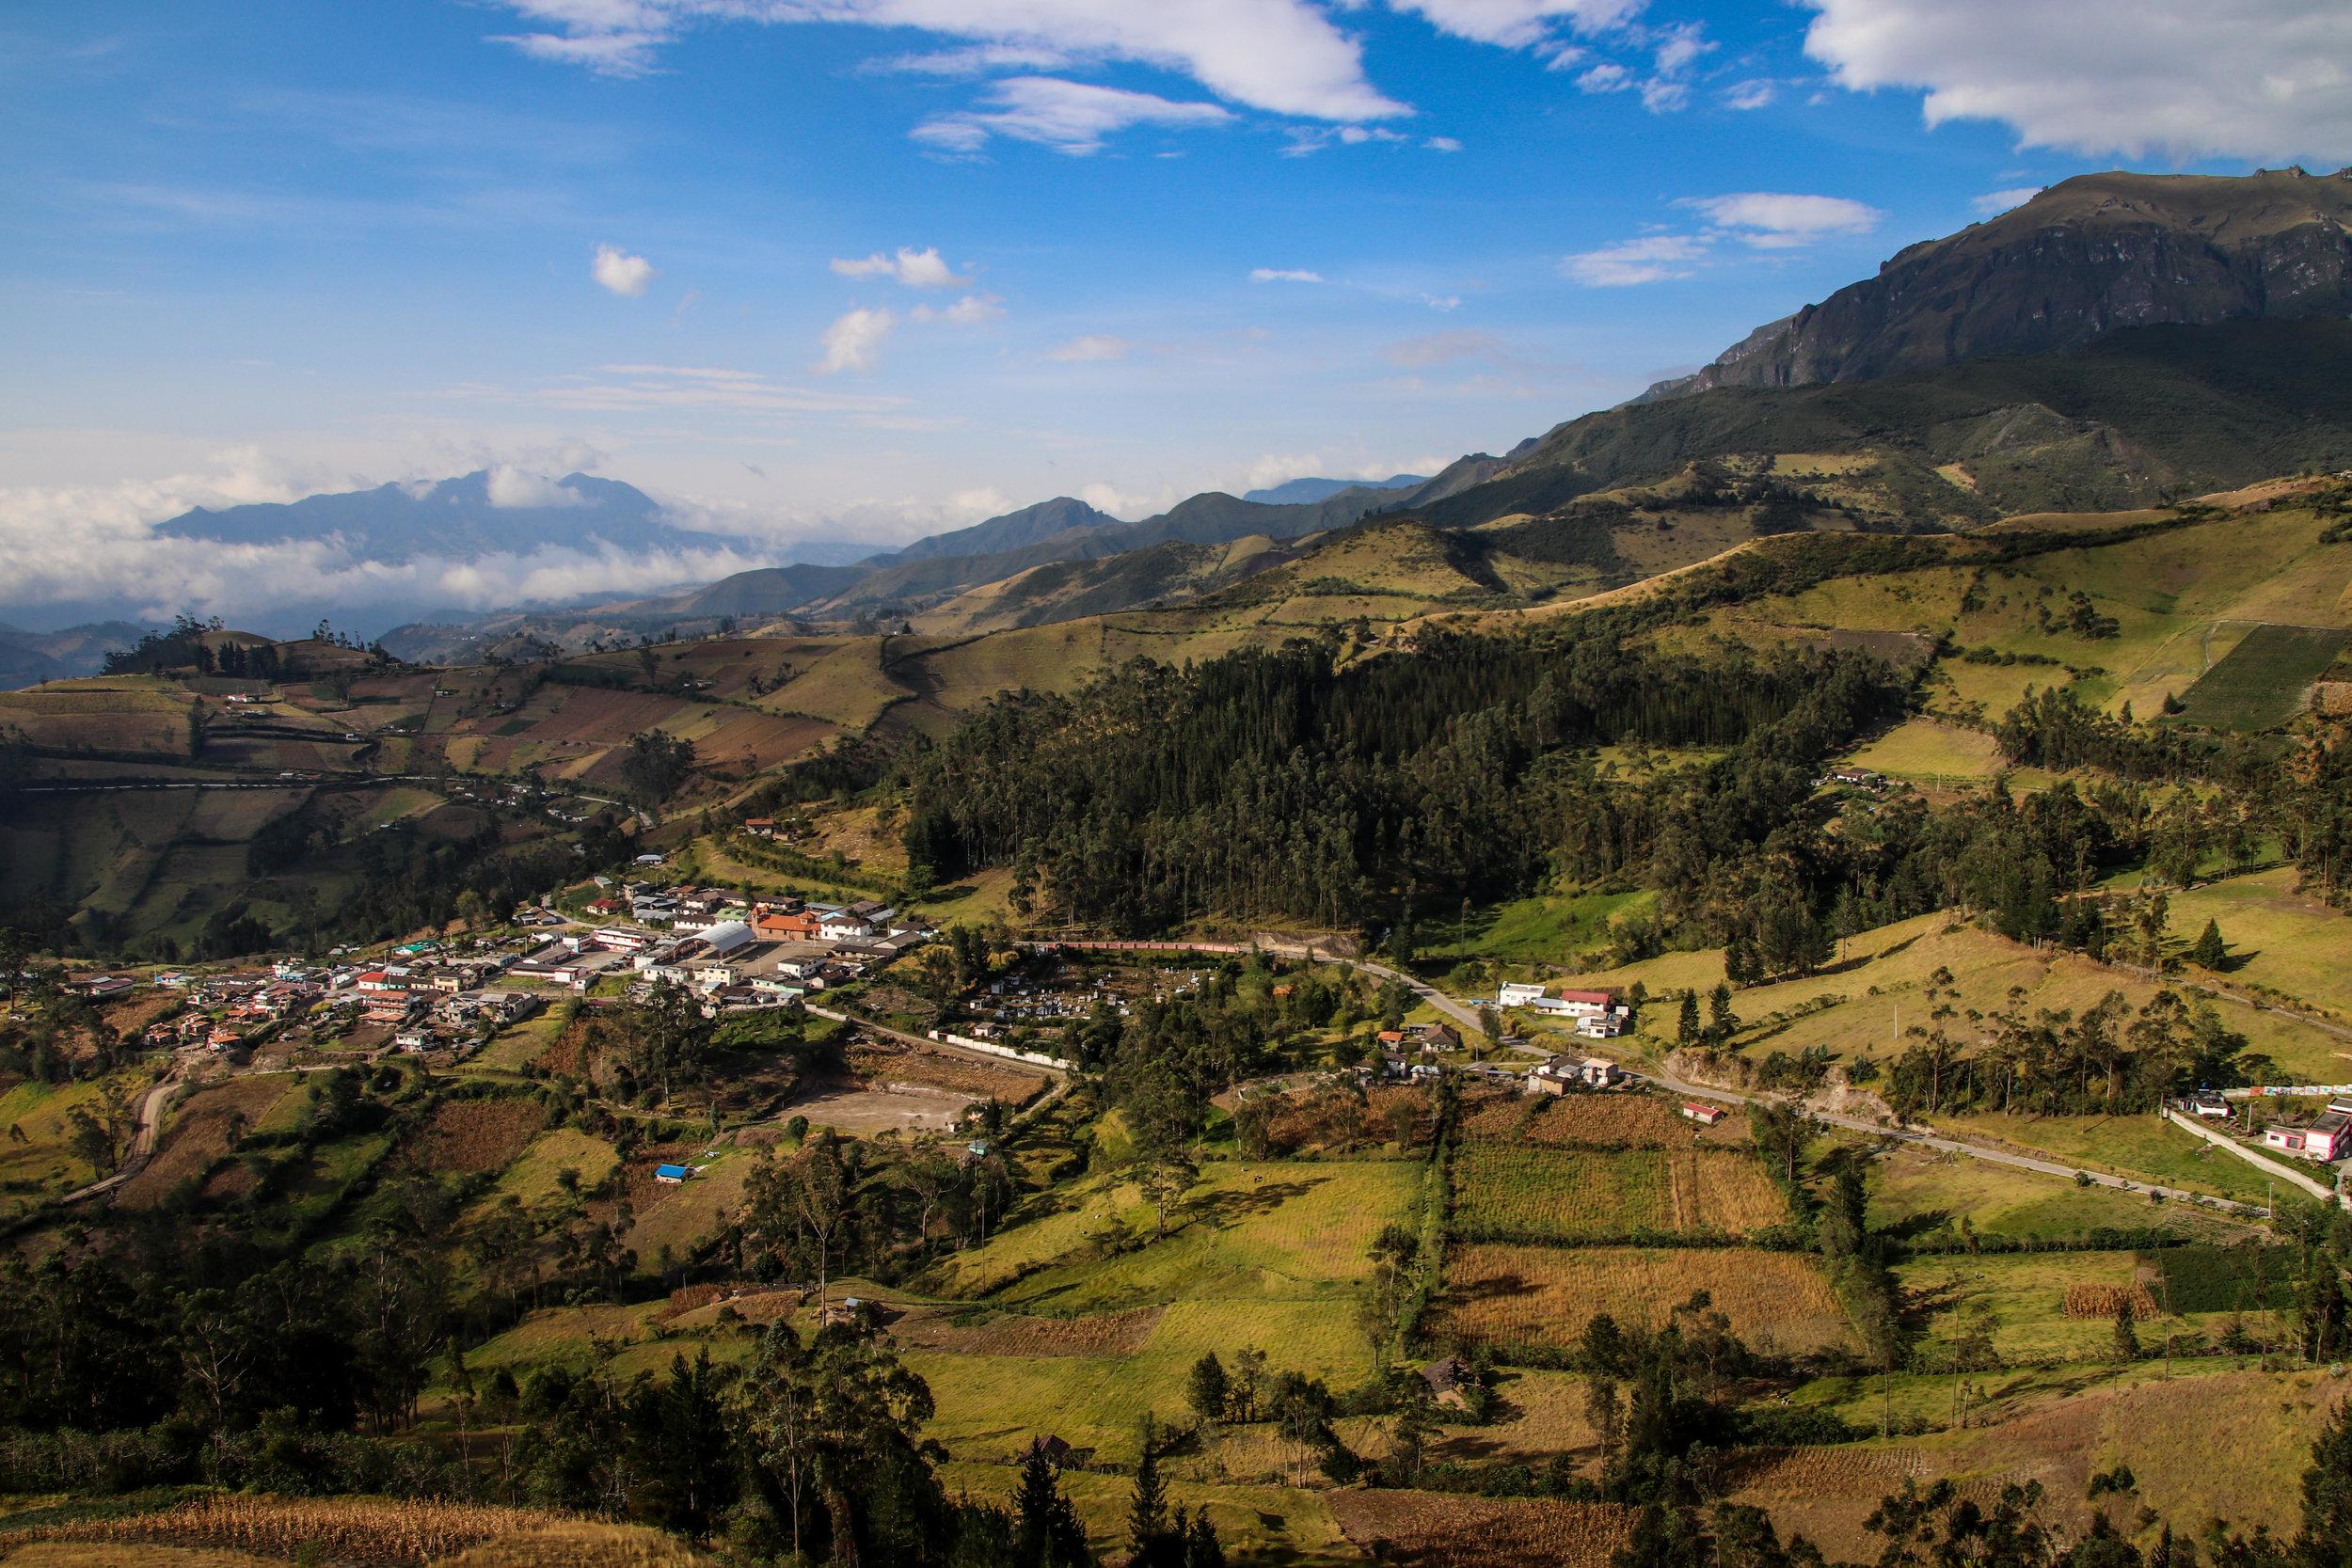 City below Traveling Quilotoa Loop, Ecuador, South America